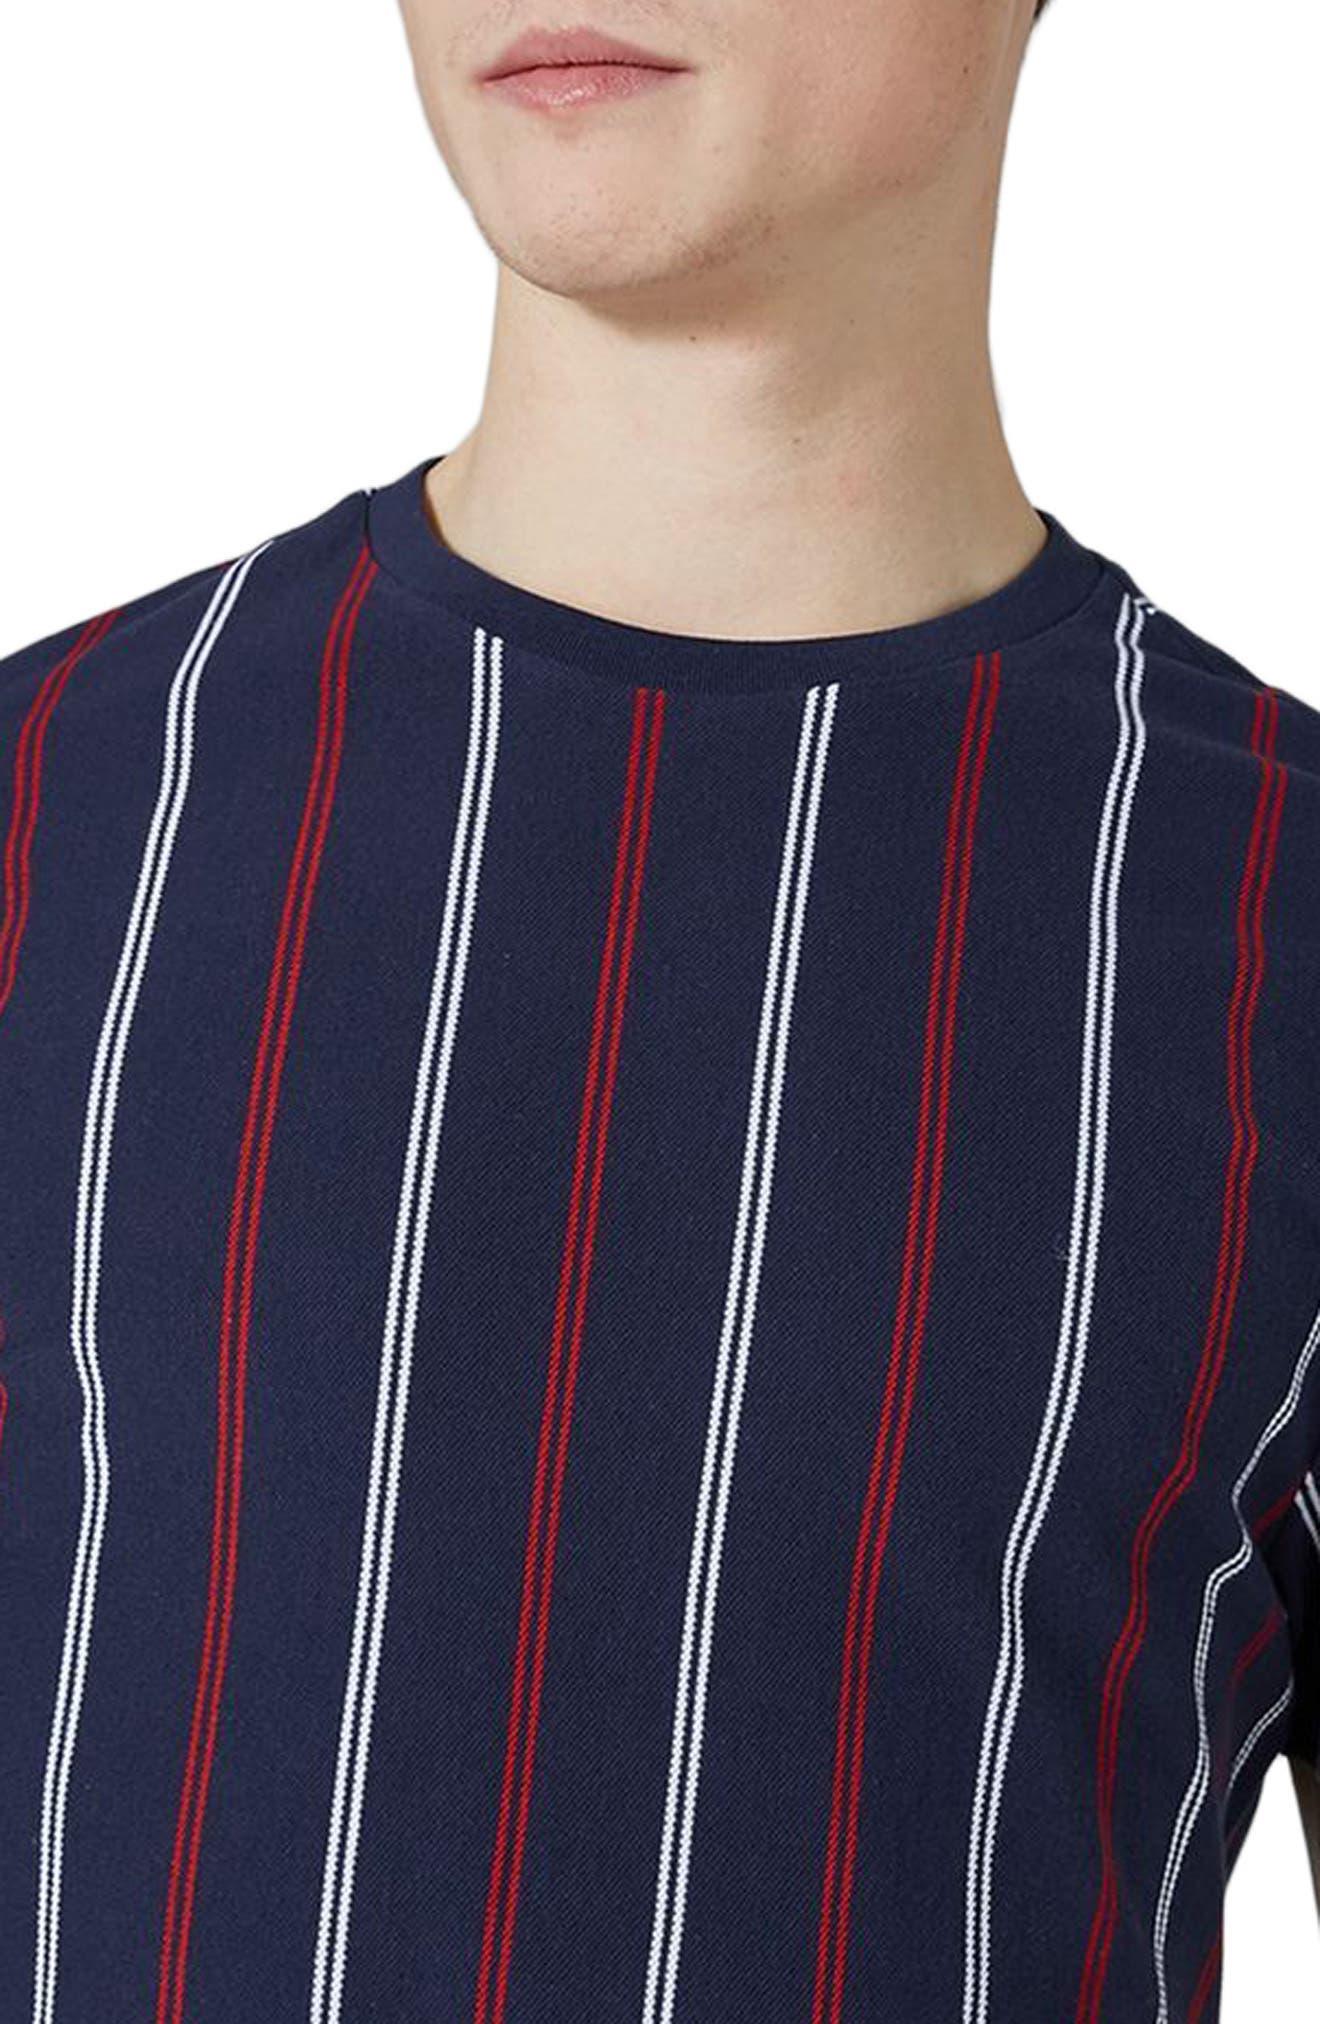 Slim Fit Vertical Striped T-Shirt,                             Alternate thumbnail 3, color,                             Dark Blue Multi